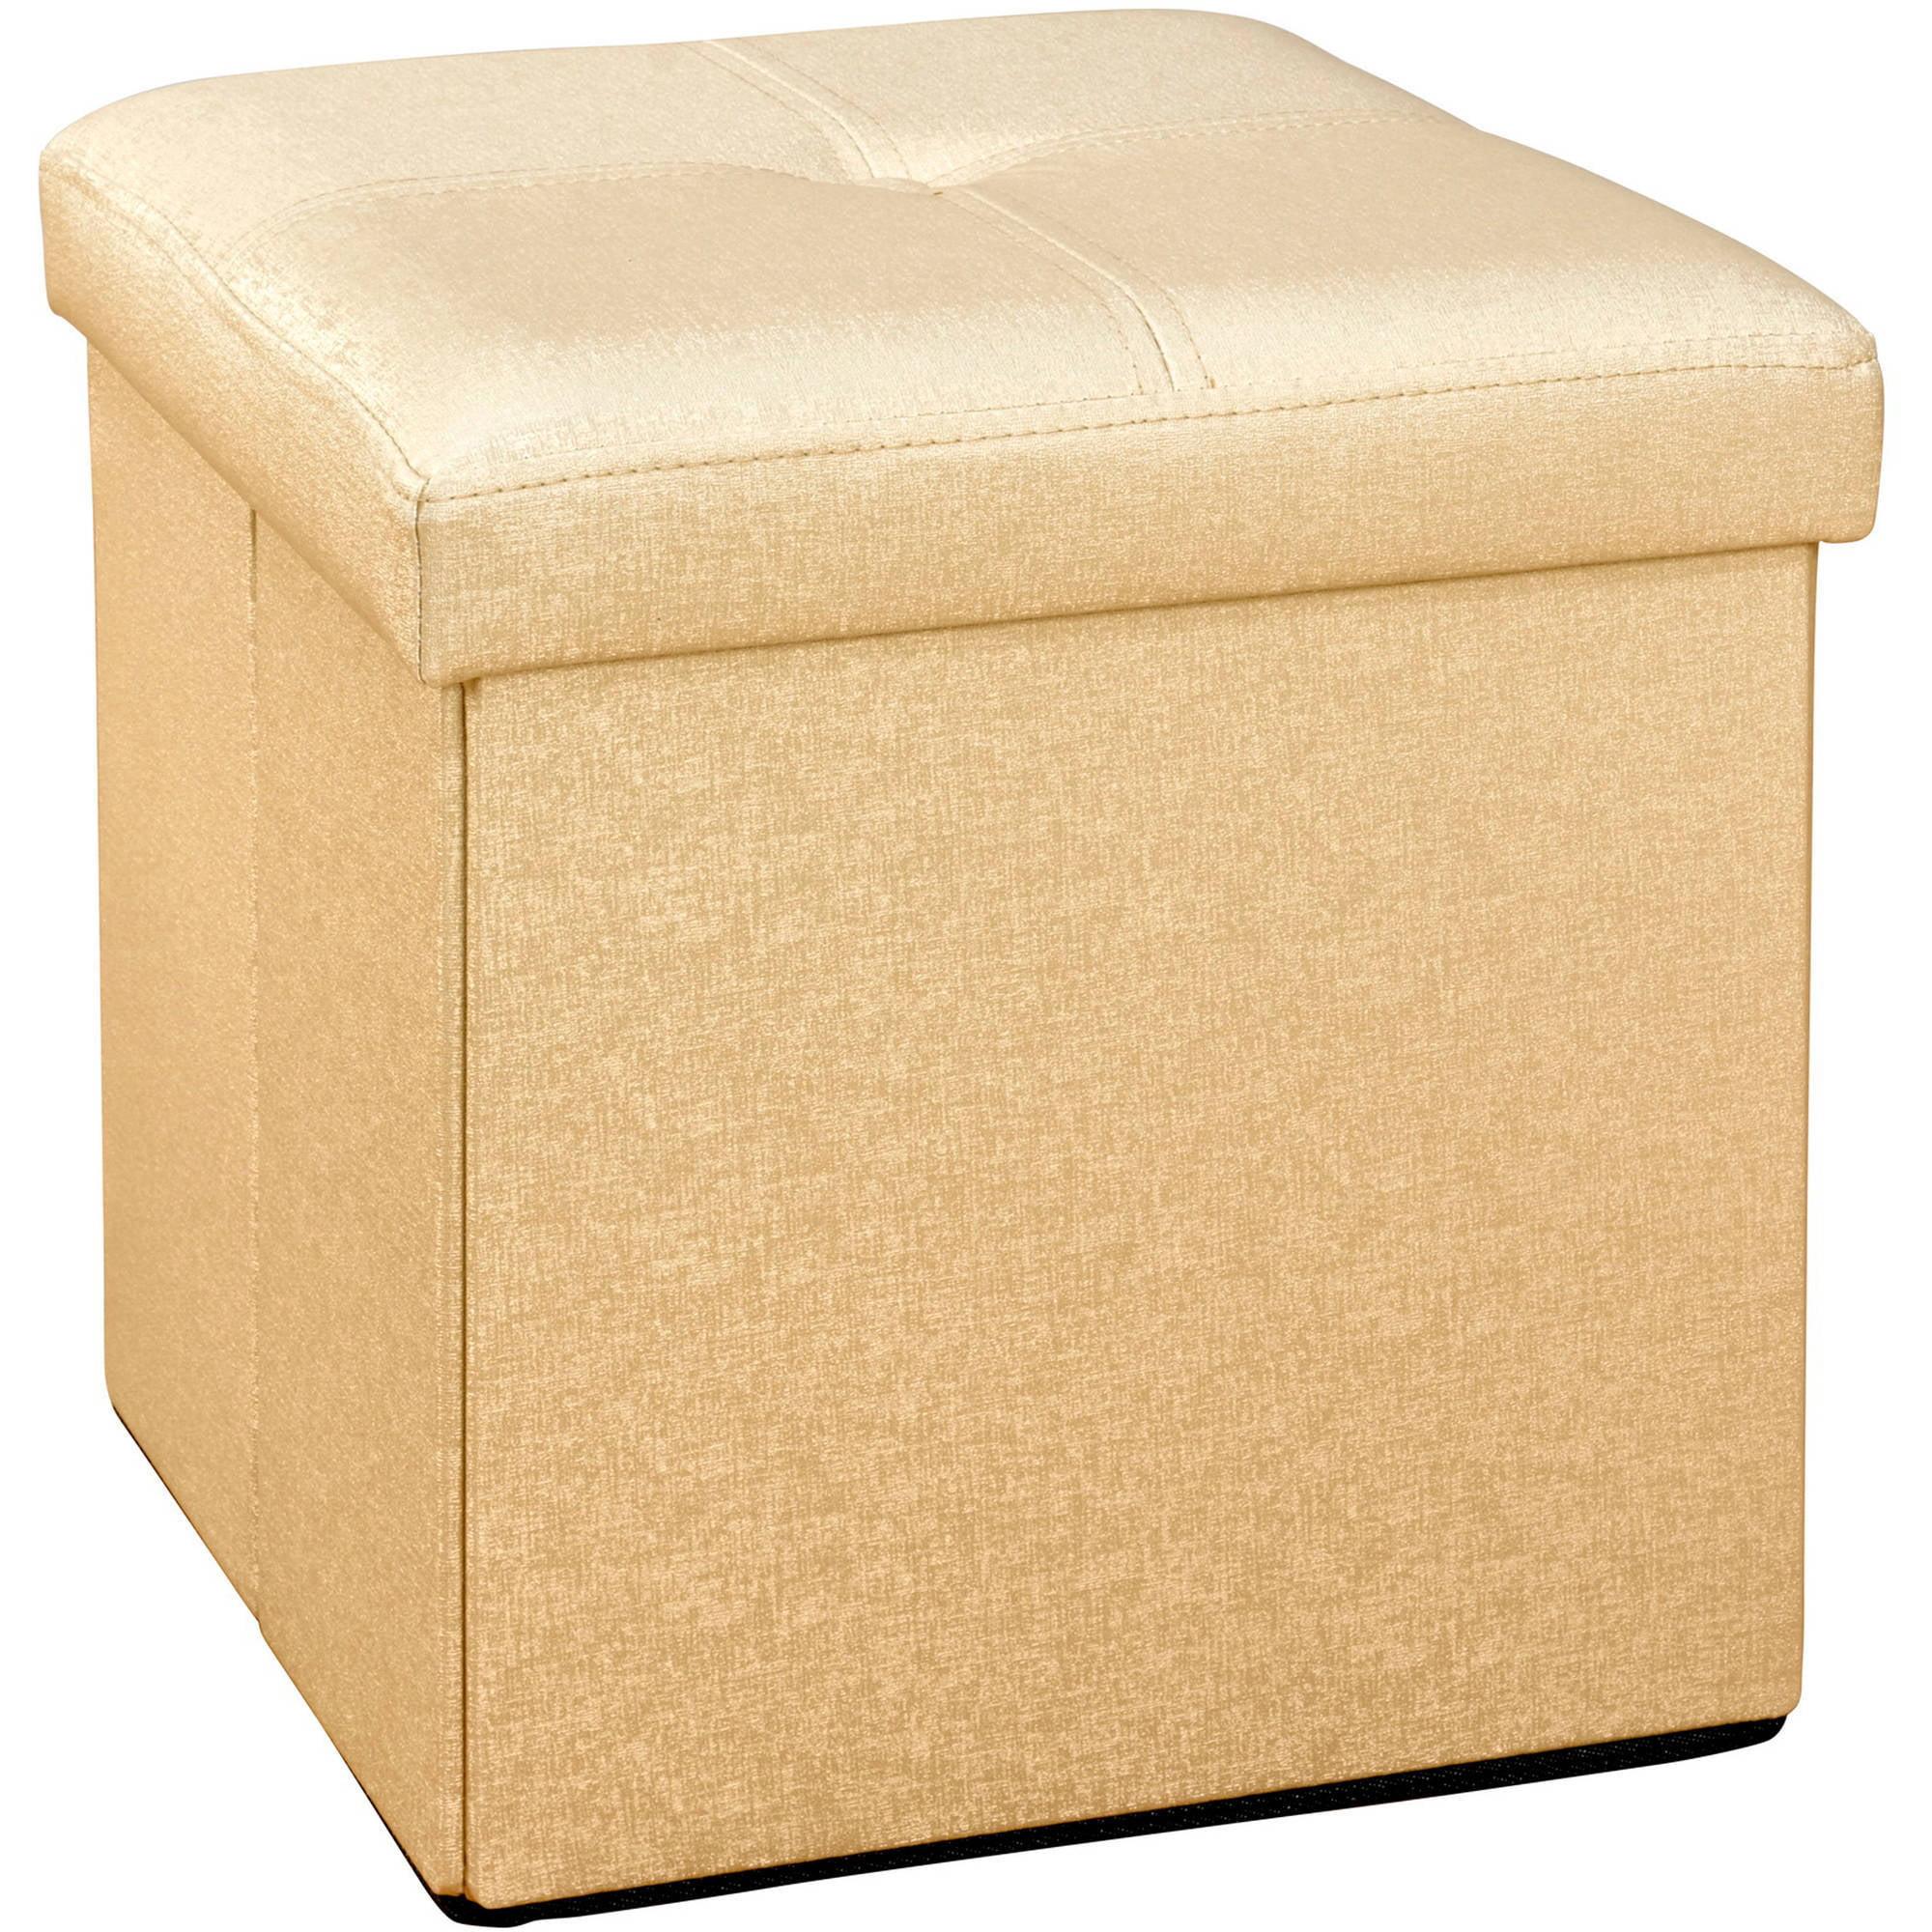 Simplify Single Folding Ottoman - Gold